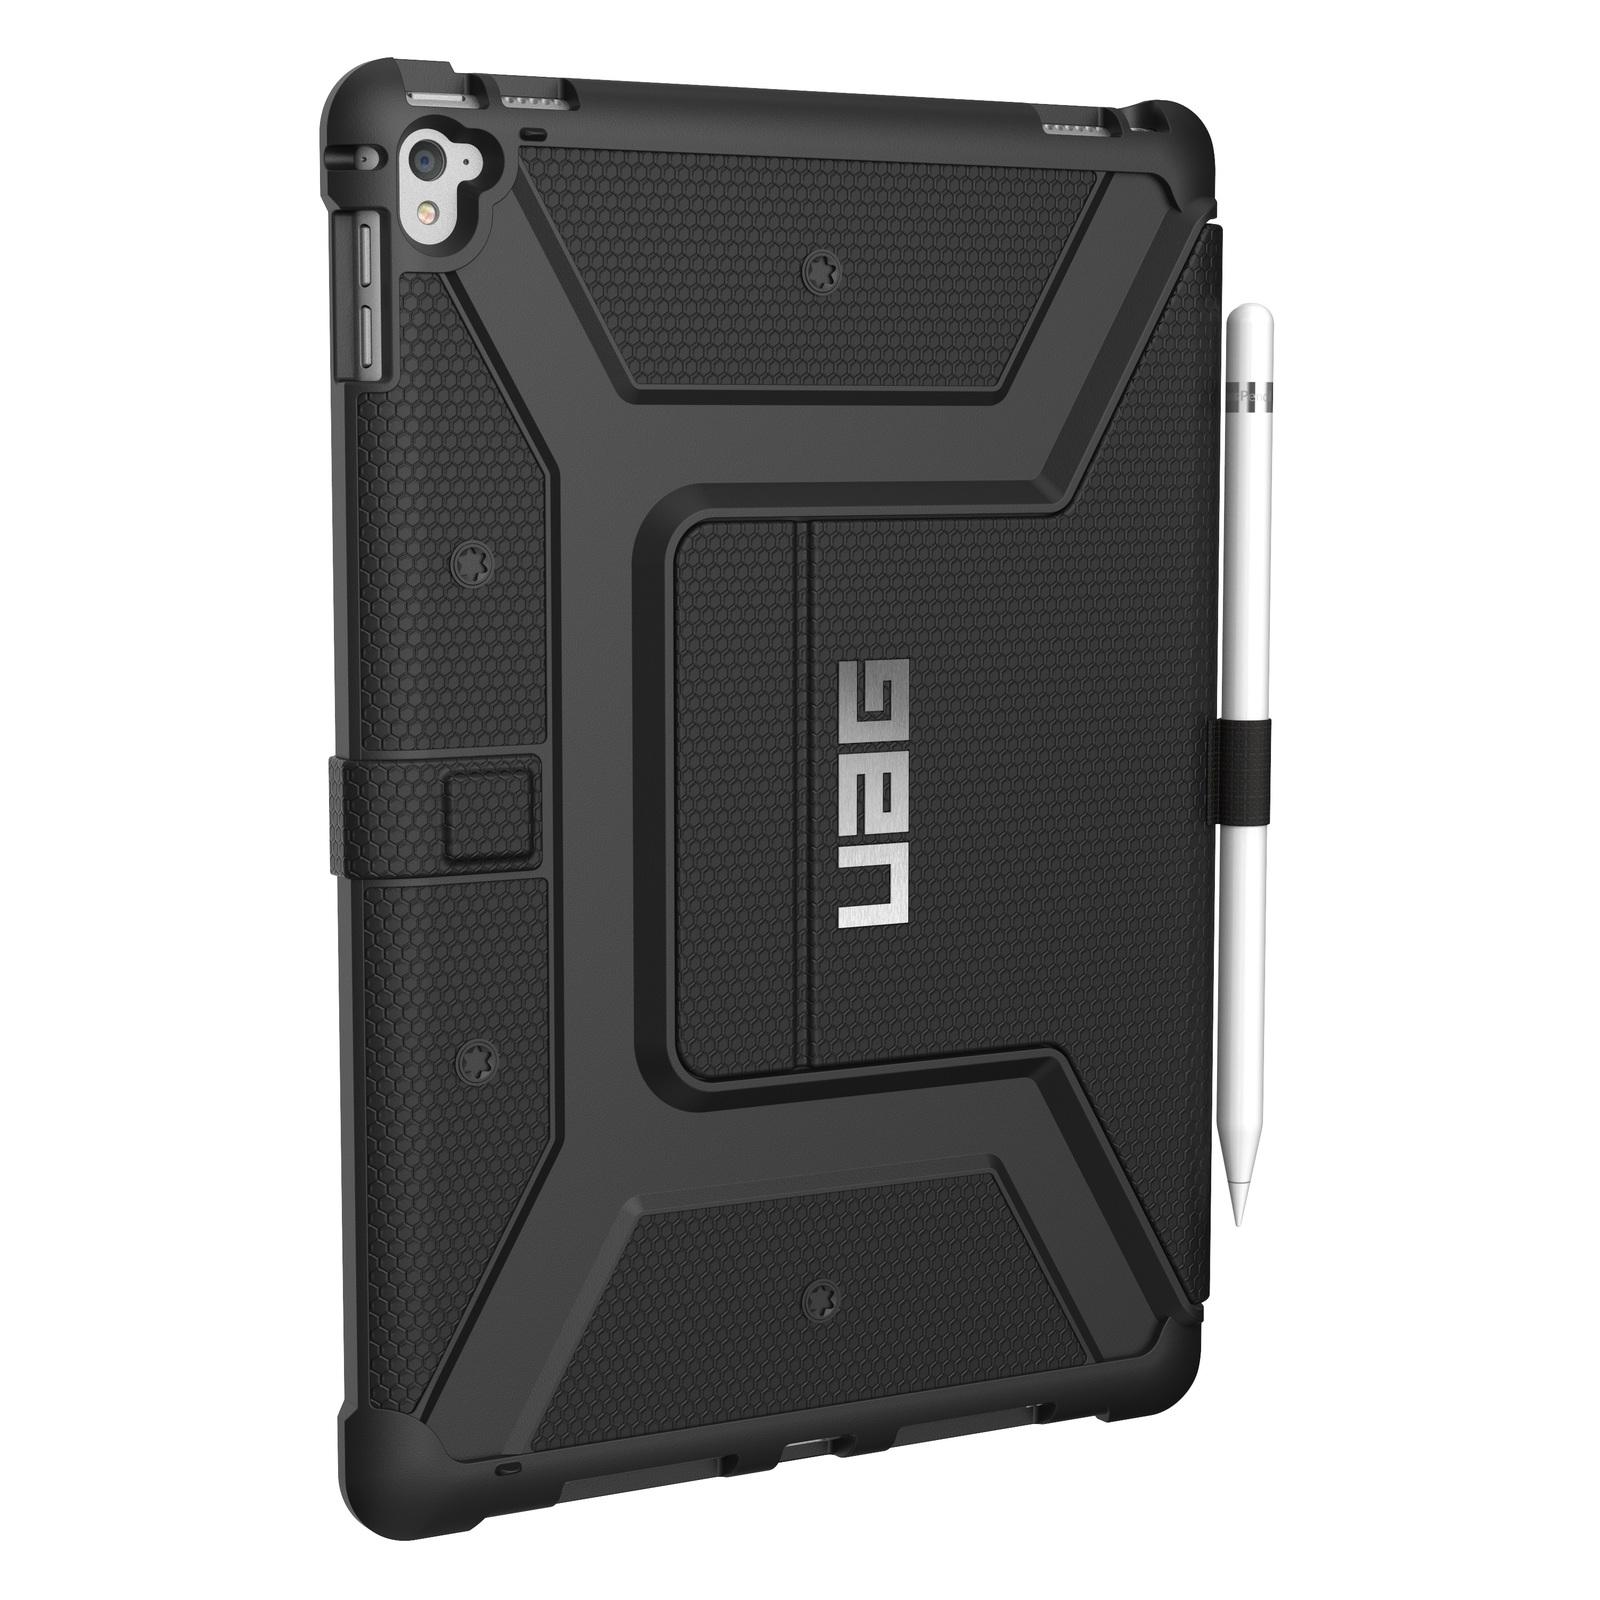 "UAG Folio Case for iPad Pro 9.7"" (Black/Black) image"